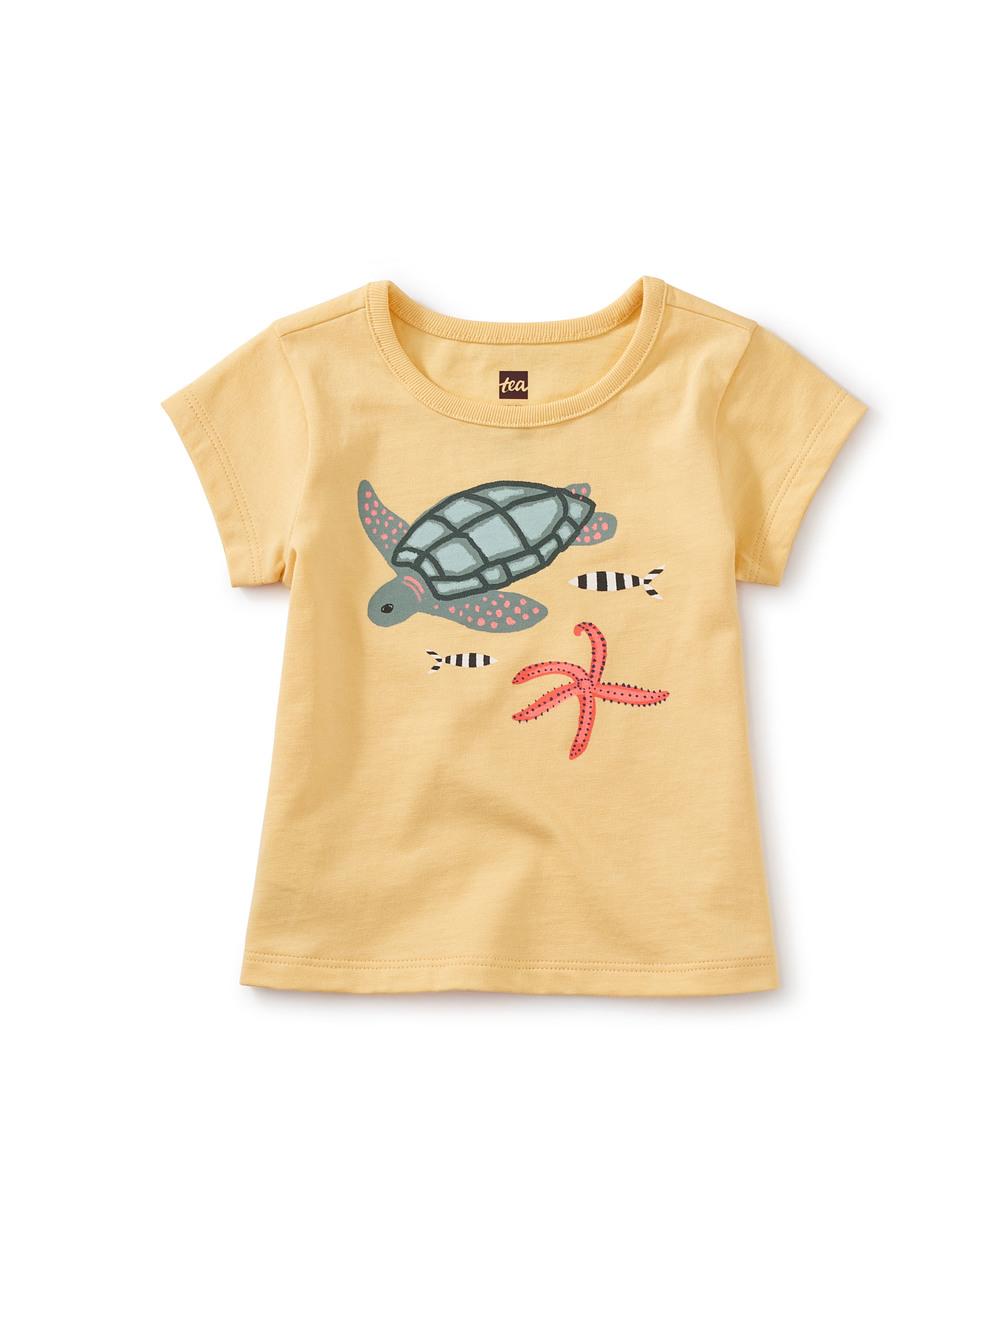 Tartaruga Baby Graphic Tee